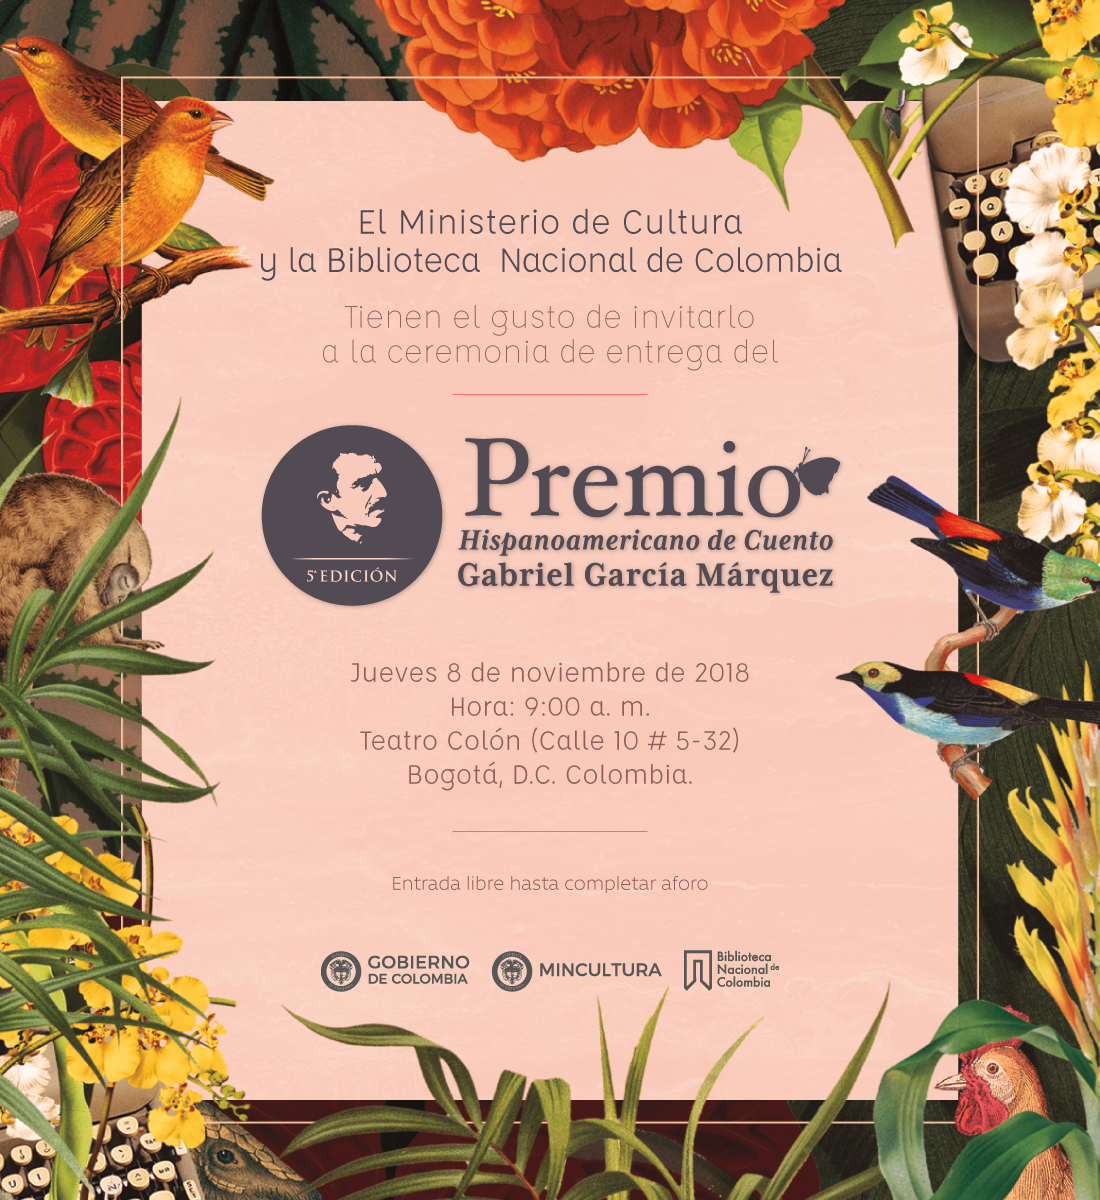 Ceremonia de entrega del V Premio Hispanoamericano de Cuento GGM